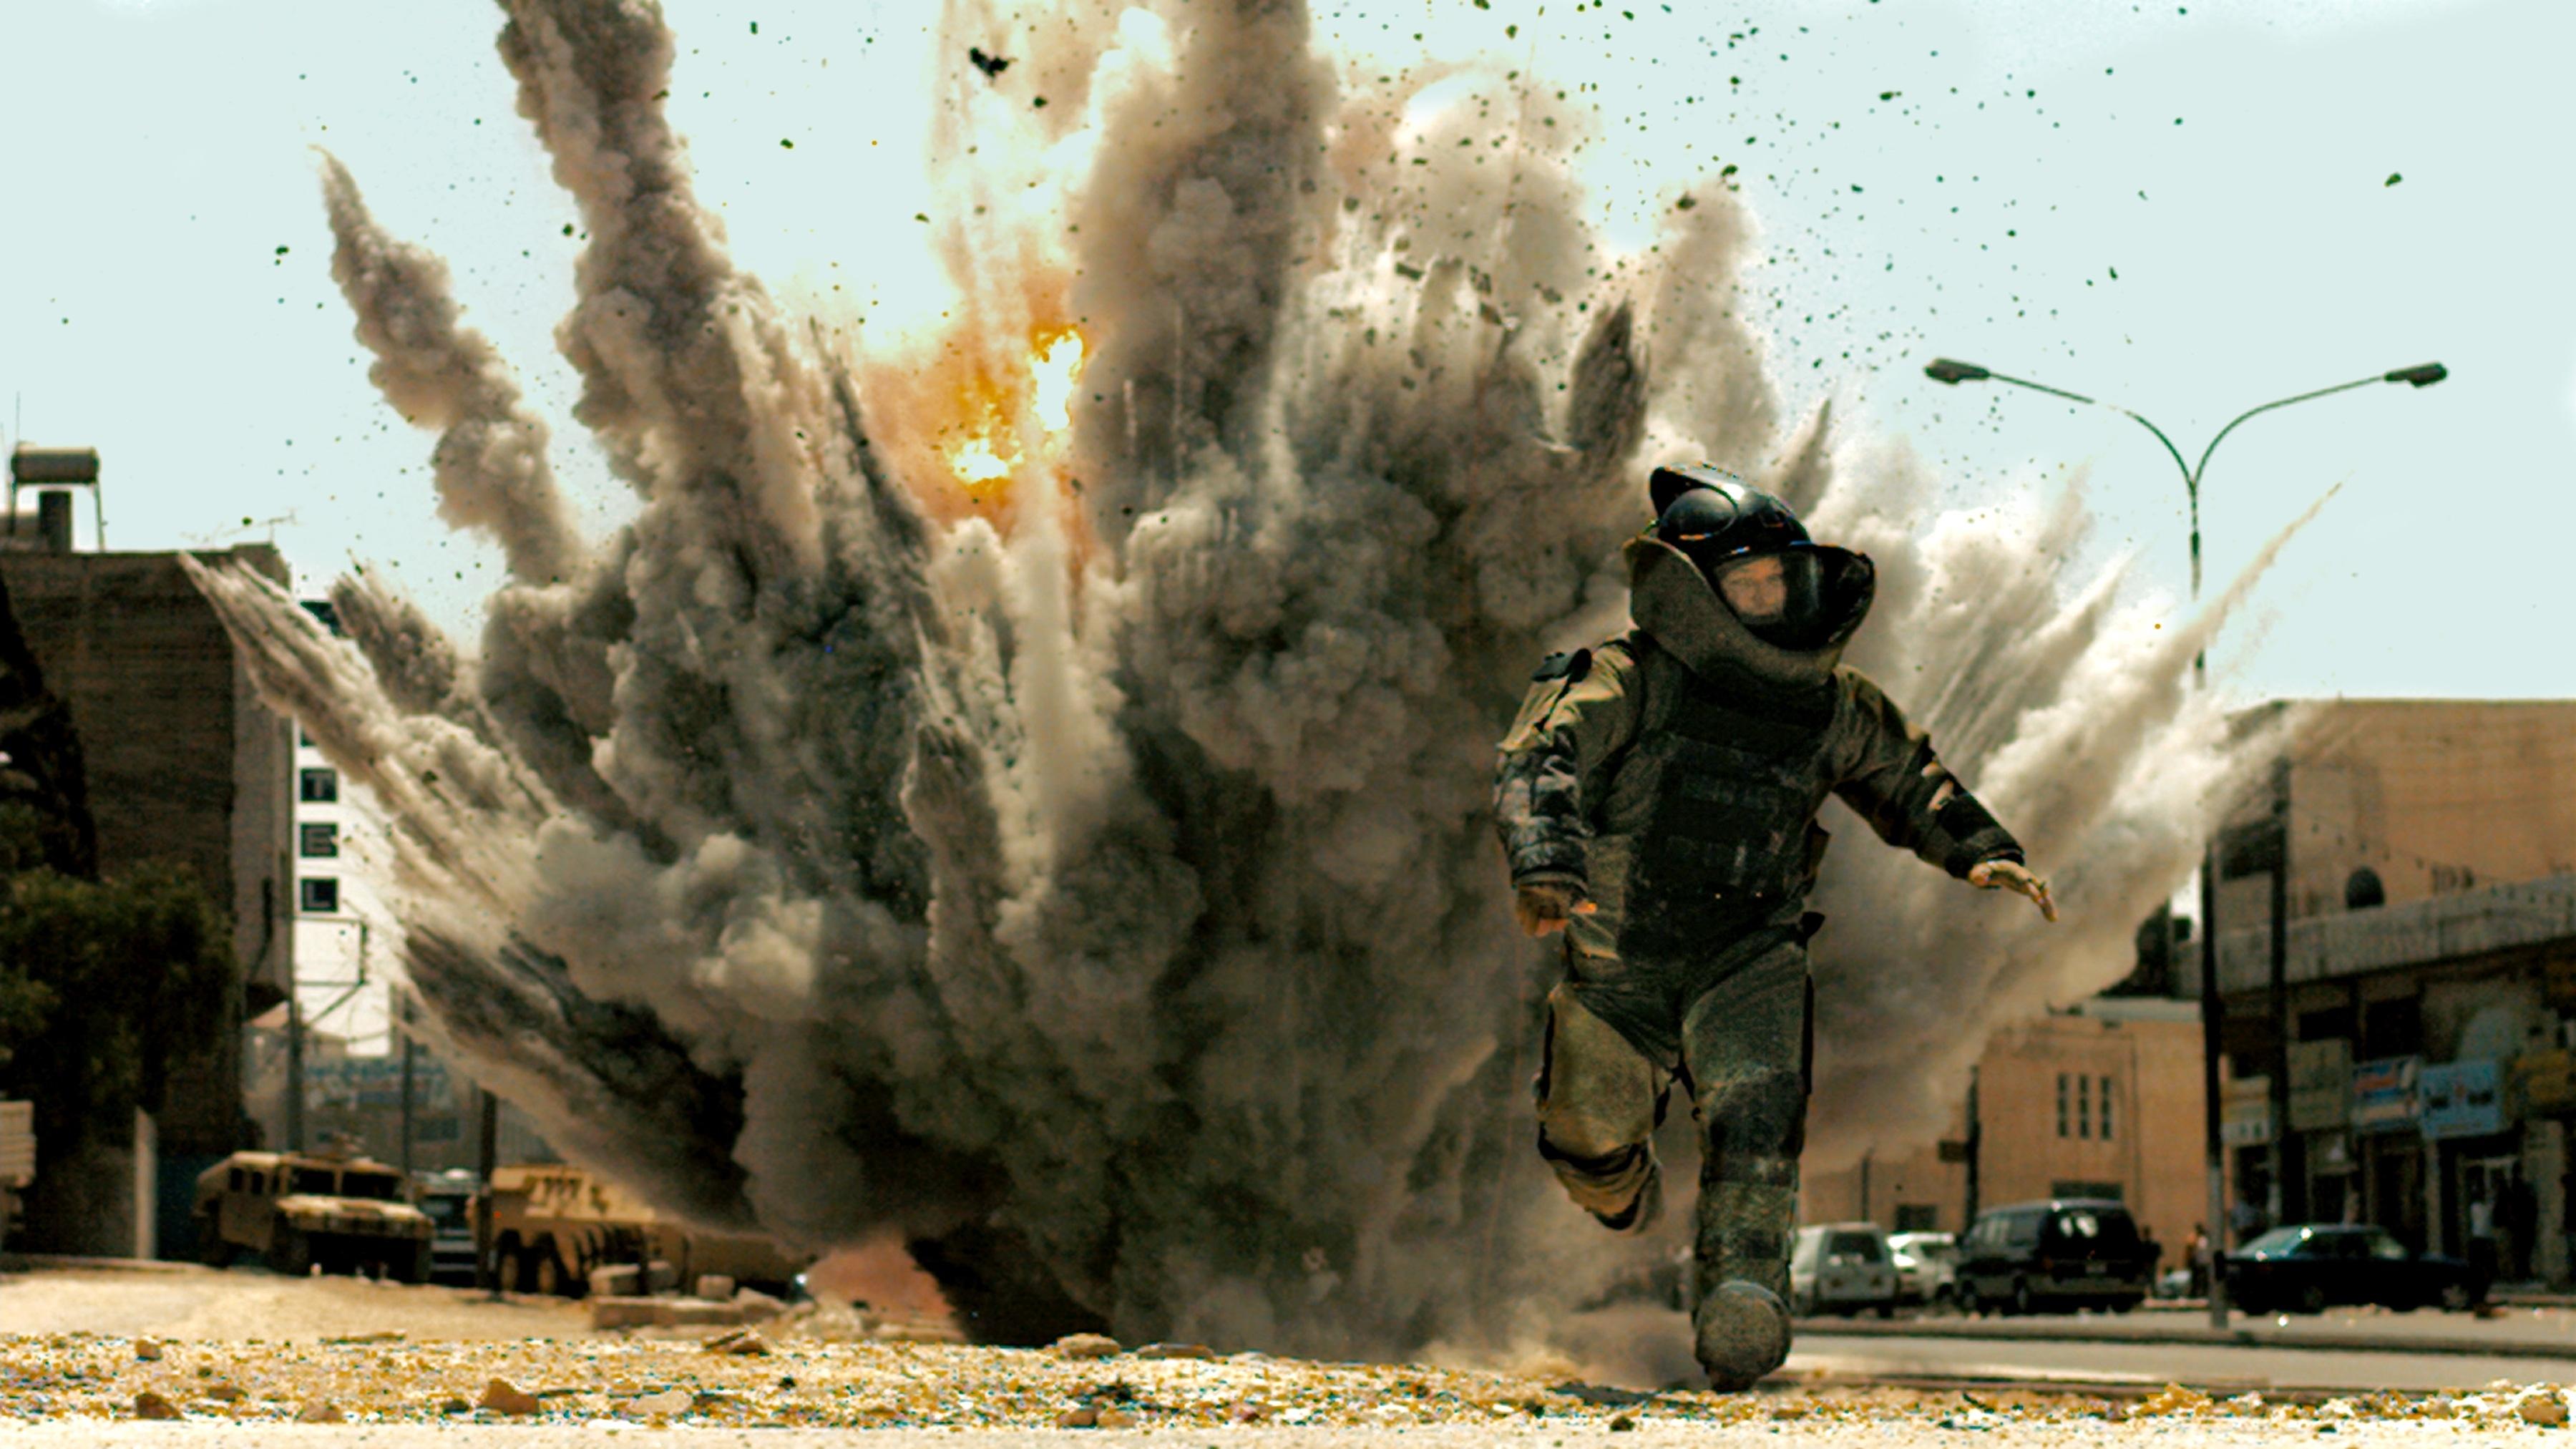 Action Film Directors Commenatries